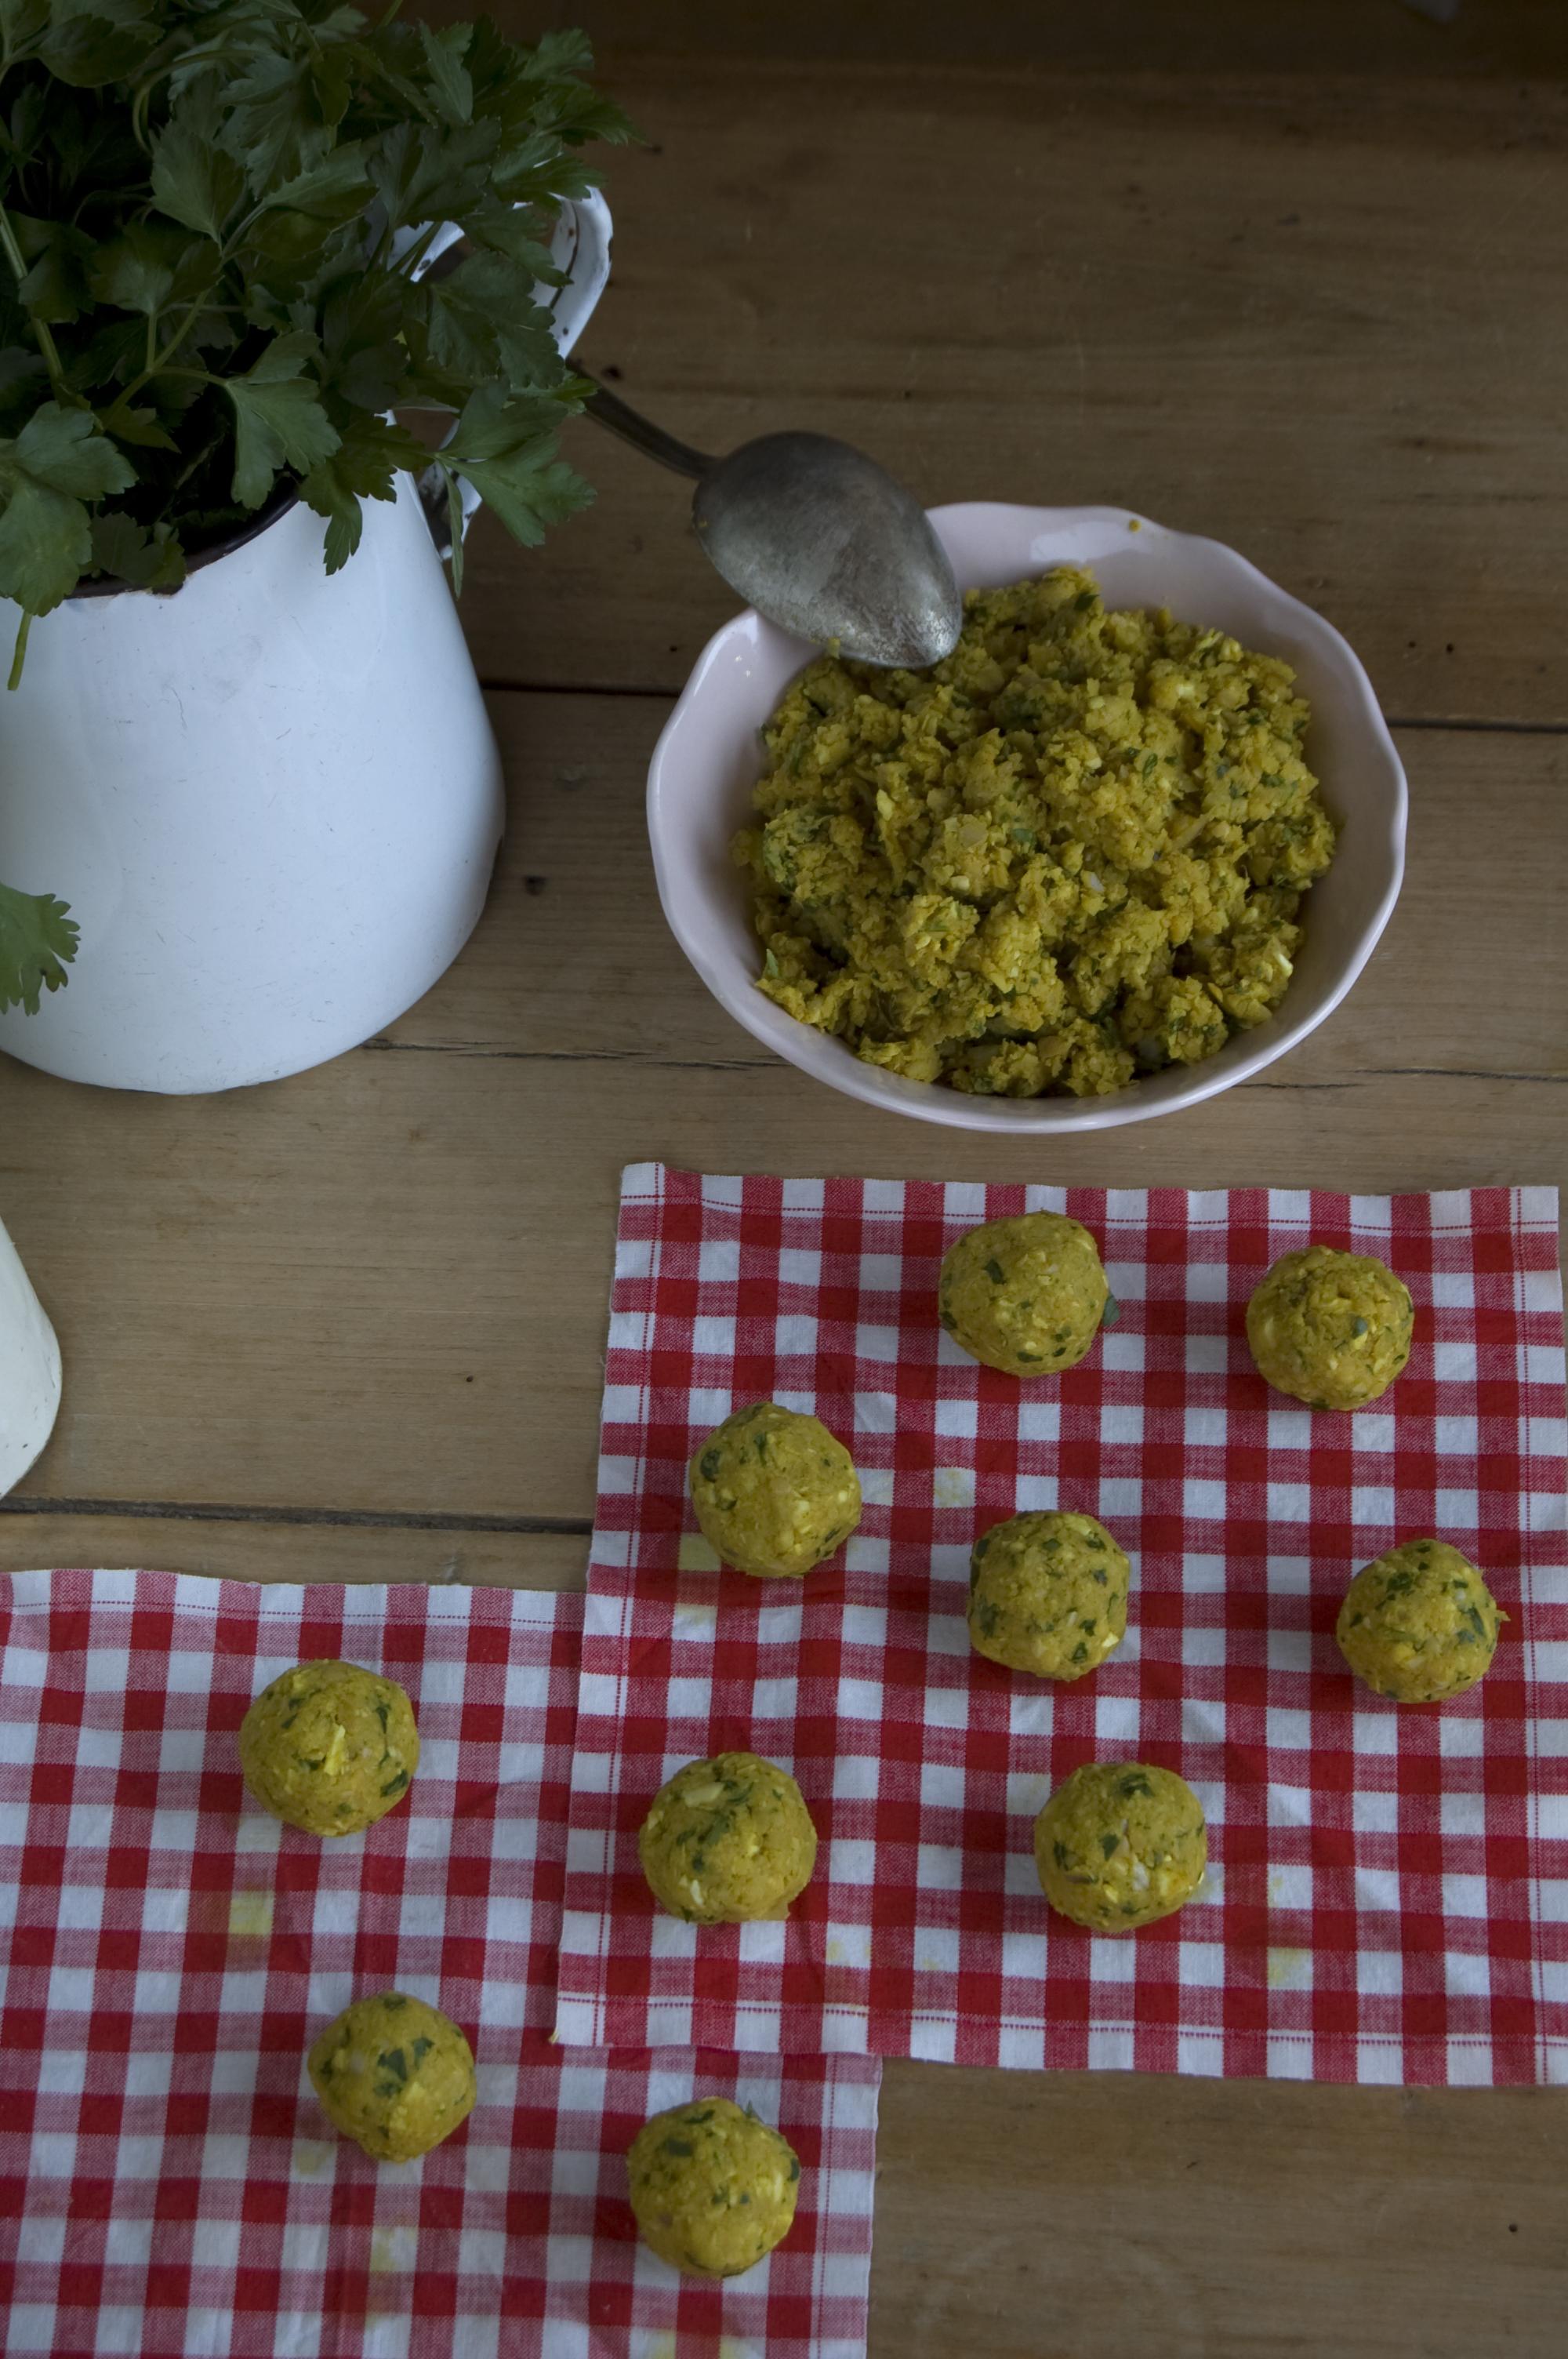 Ten perejil fresco a mano para hacer tu falafel